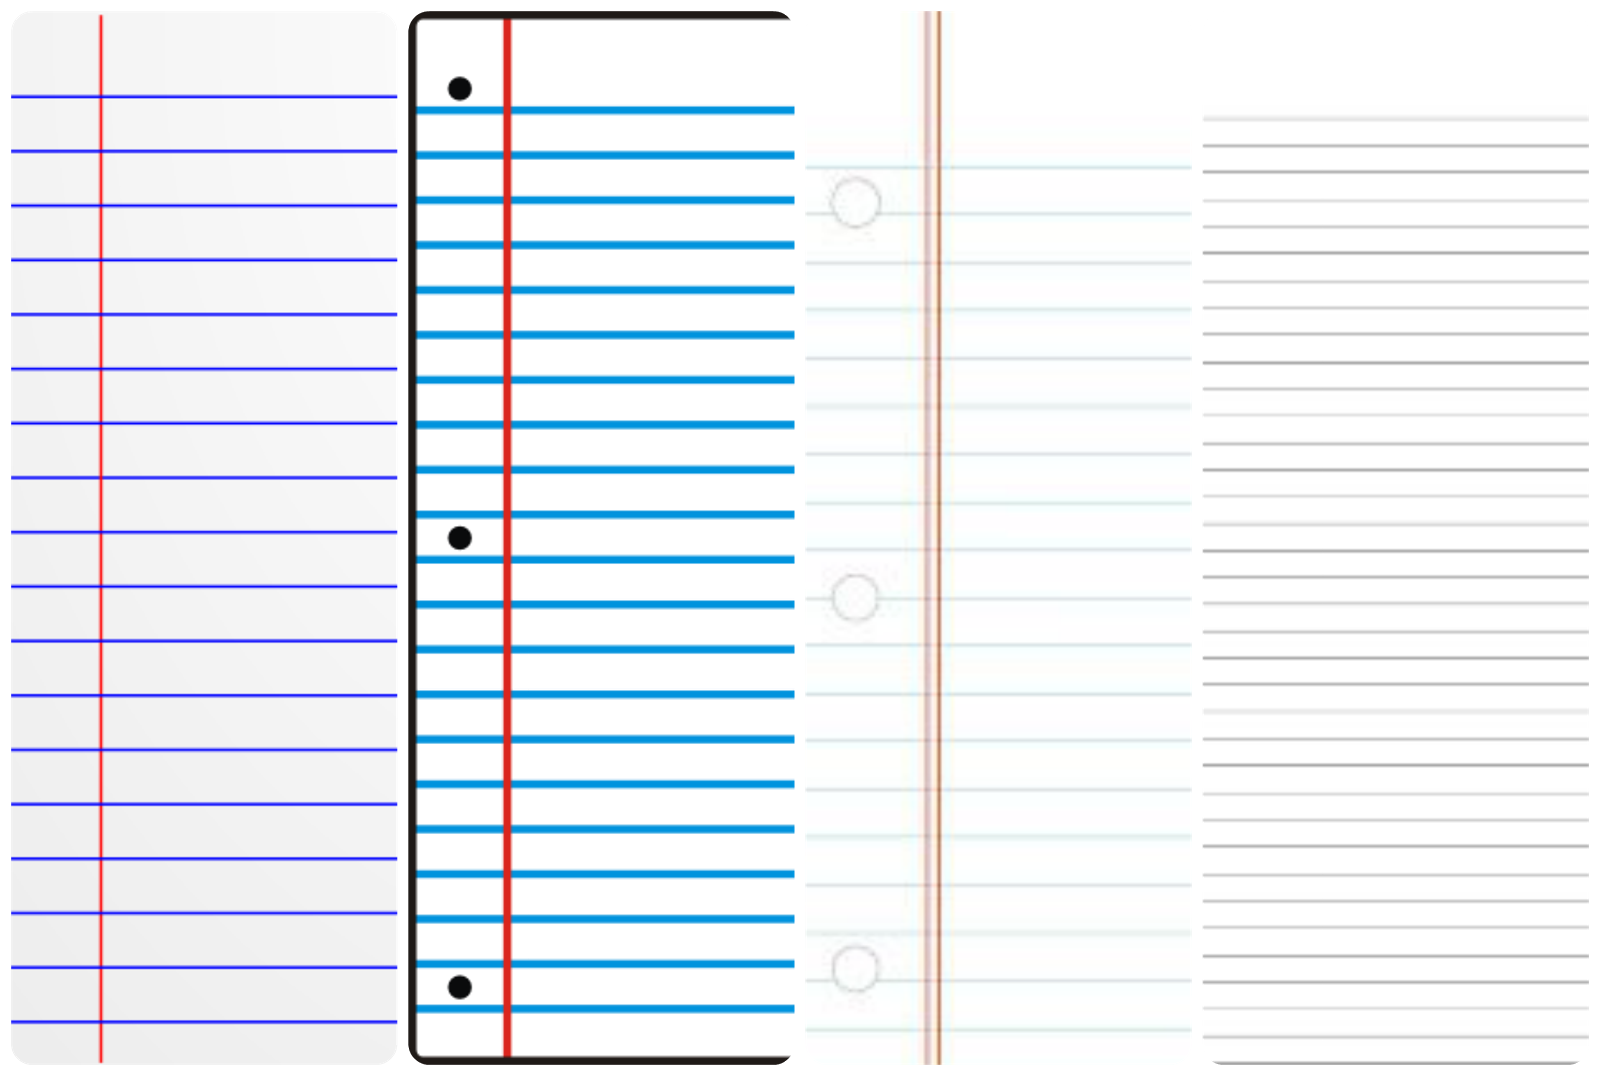 fondos chulos molones de pantalla móvil celular iphone android notebook lines pattern